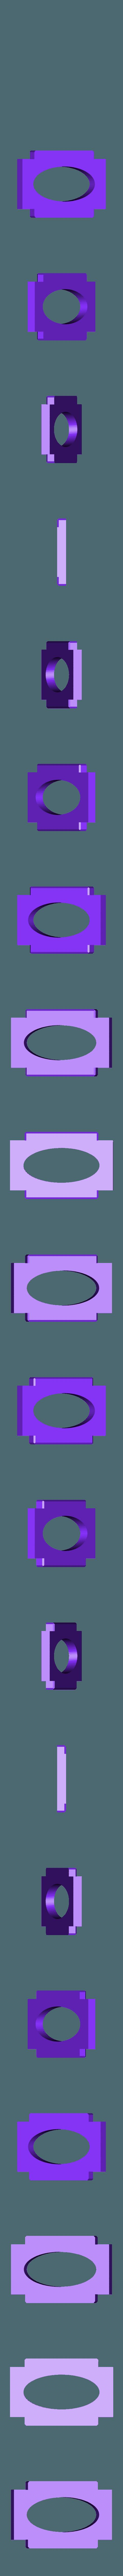 HDS 3-H.STL Download STL file NEW - Hard Drive SKYSCRAPER • 3D printer template, salva65